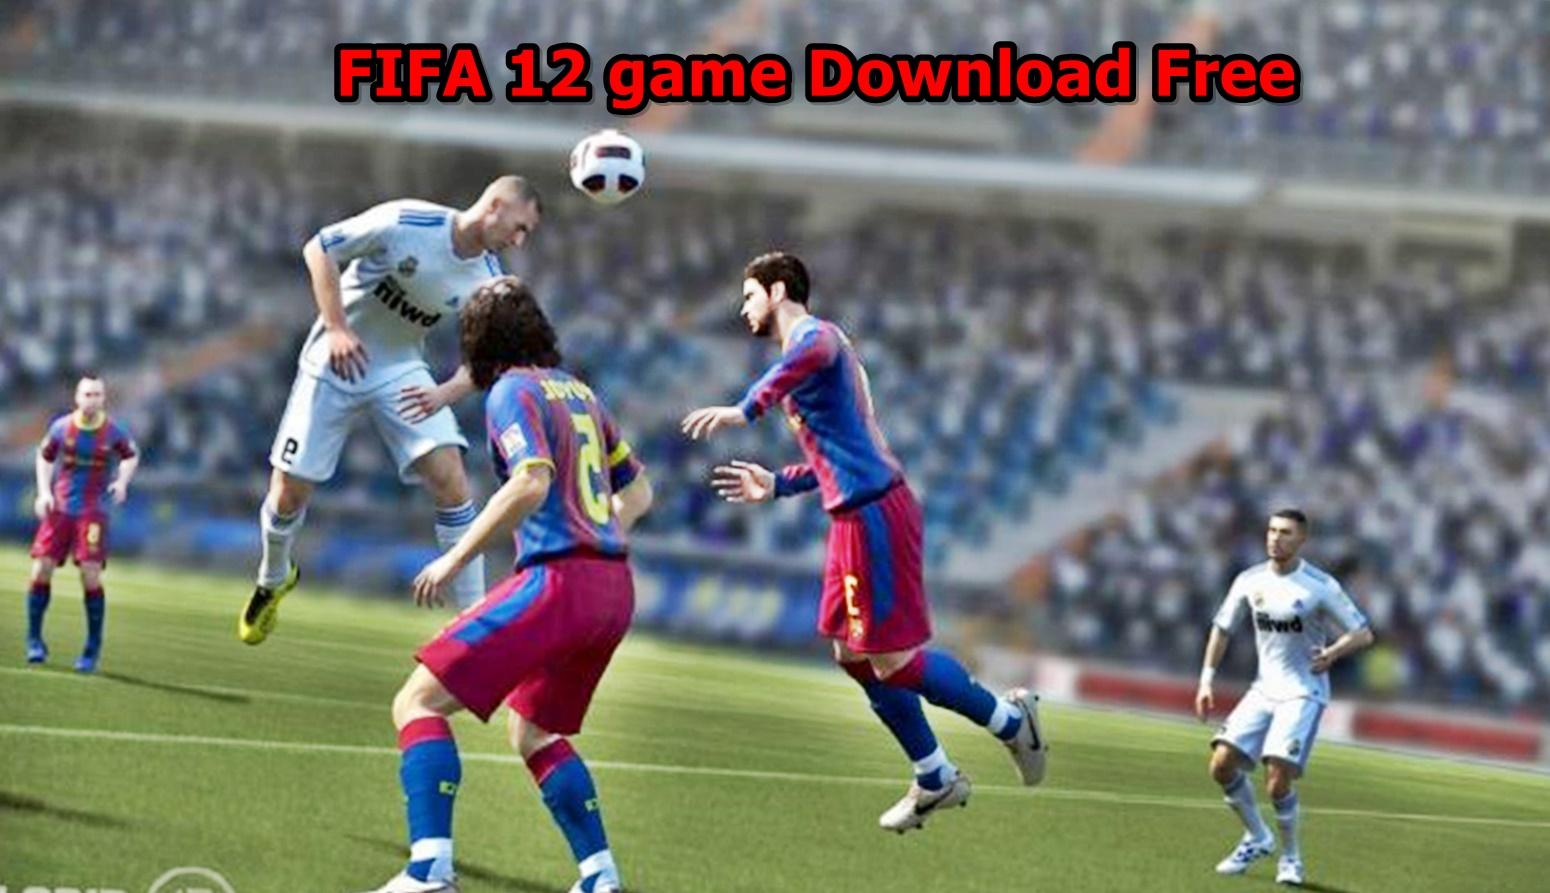 FIFA 12 game Download Free